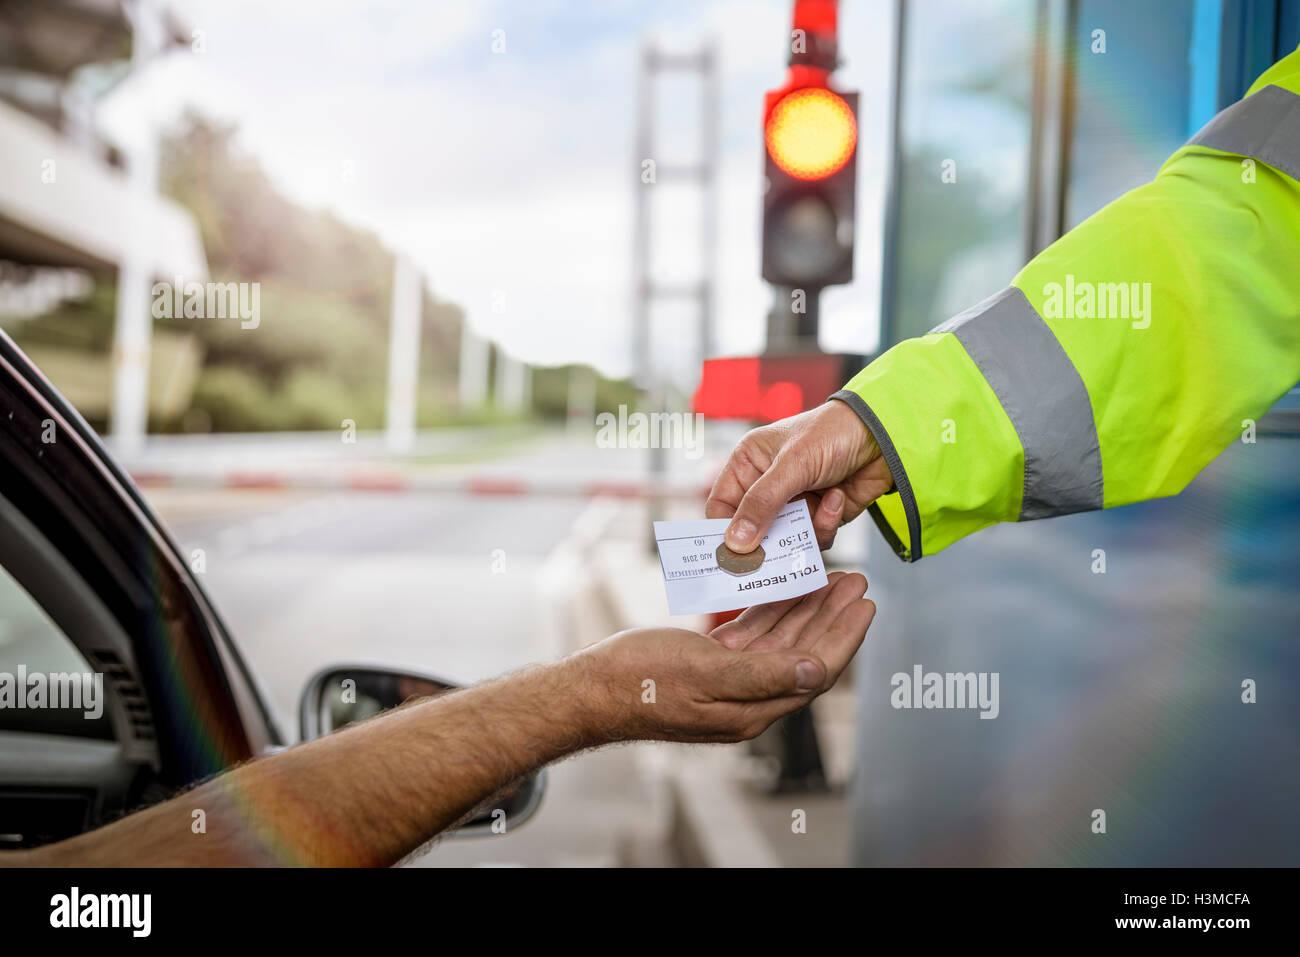 Fahrer im Auto zahlenden Mautstelle an der Brücke, Nahaufnahme Stockbild